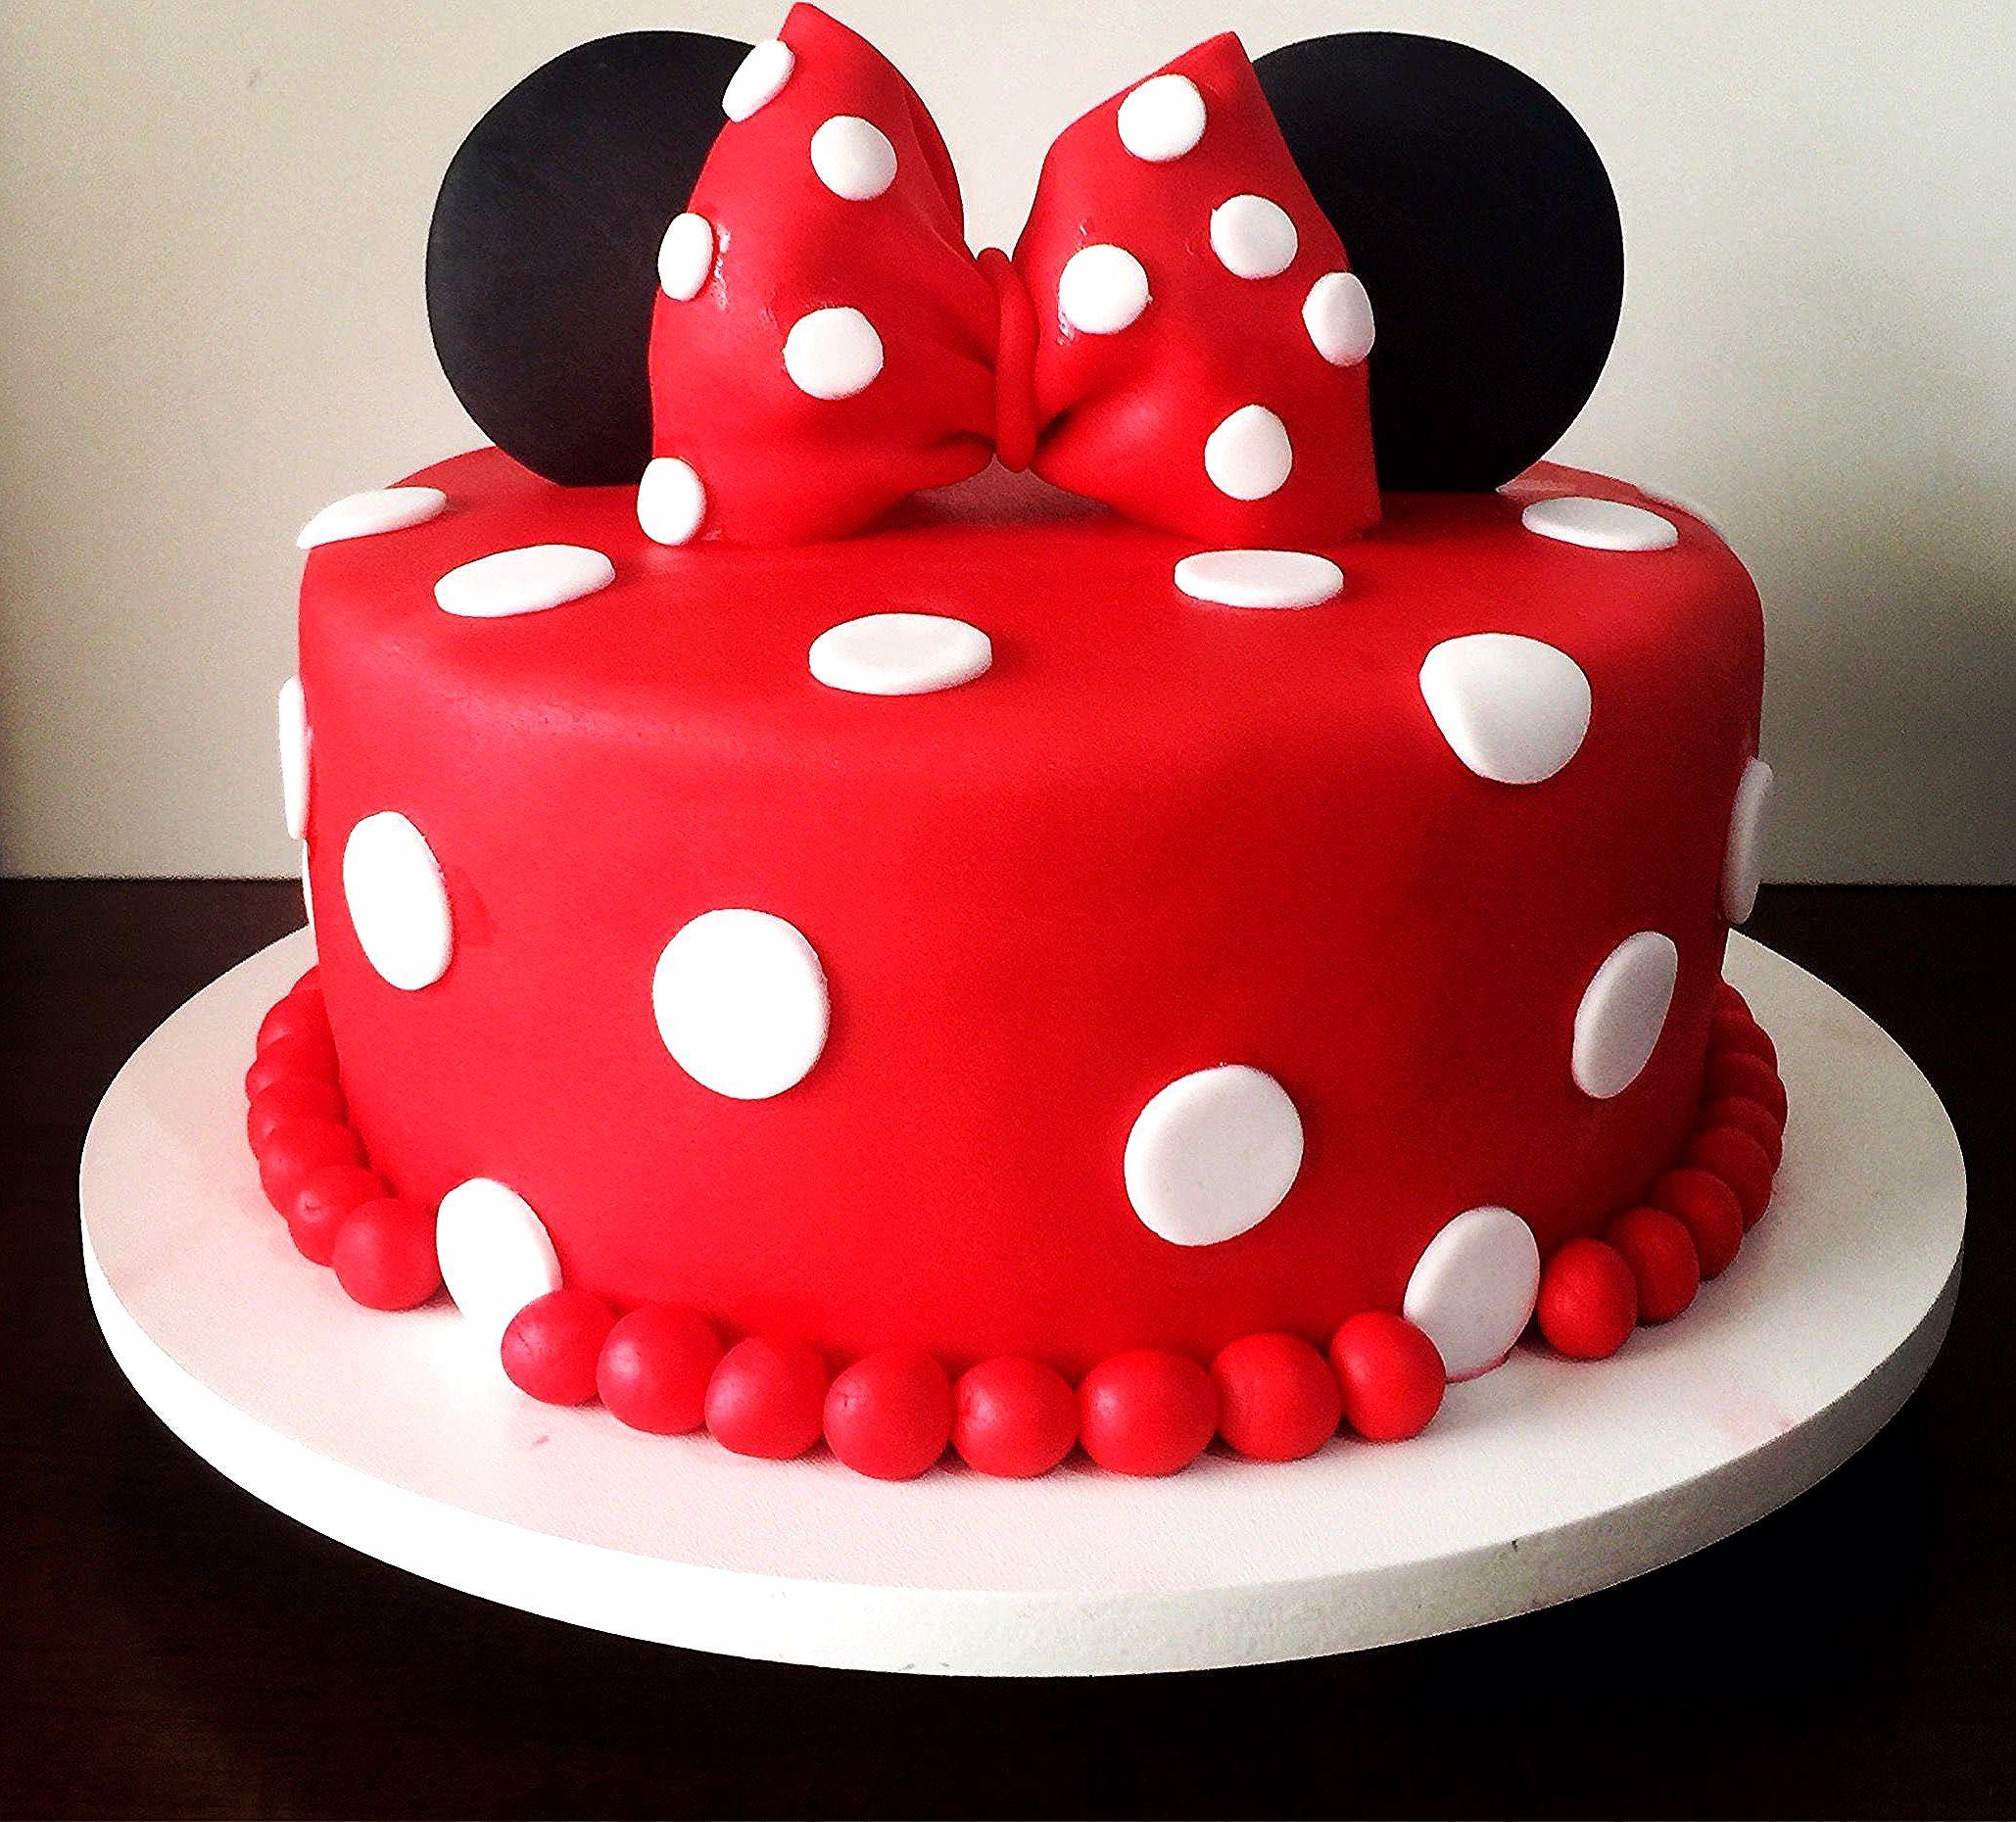 Minnie Mouse - Bolo Decorado #minniemouse Minnie Mouse - Bolo Decorado in  2020 | Minnie mouse birthday cakes, Minnie cake, Mickey and minnie cake